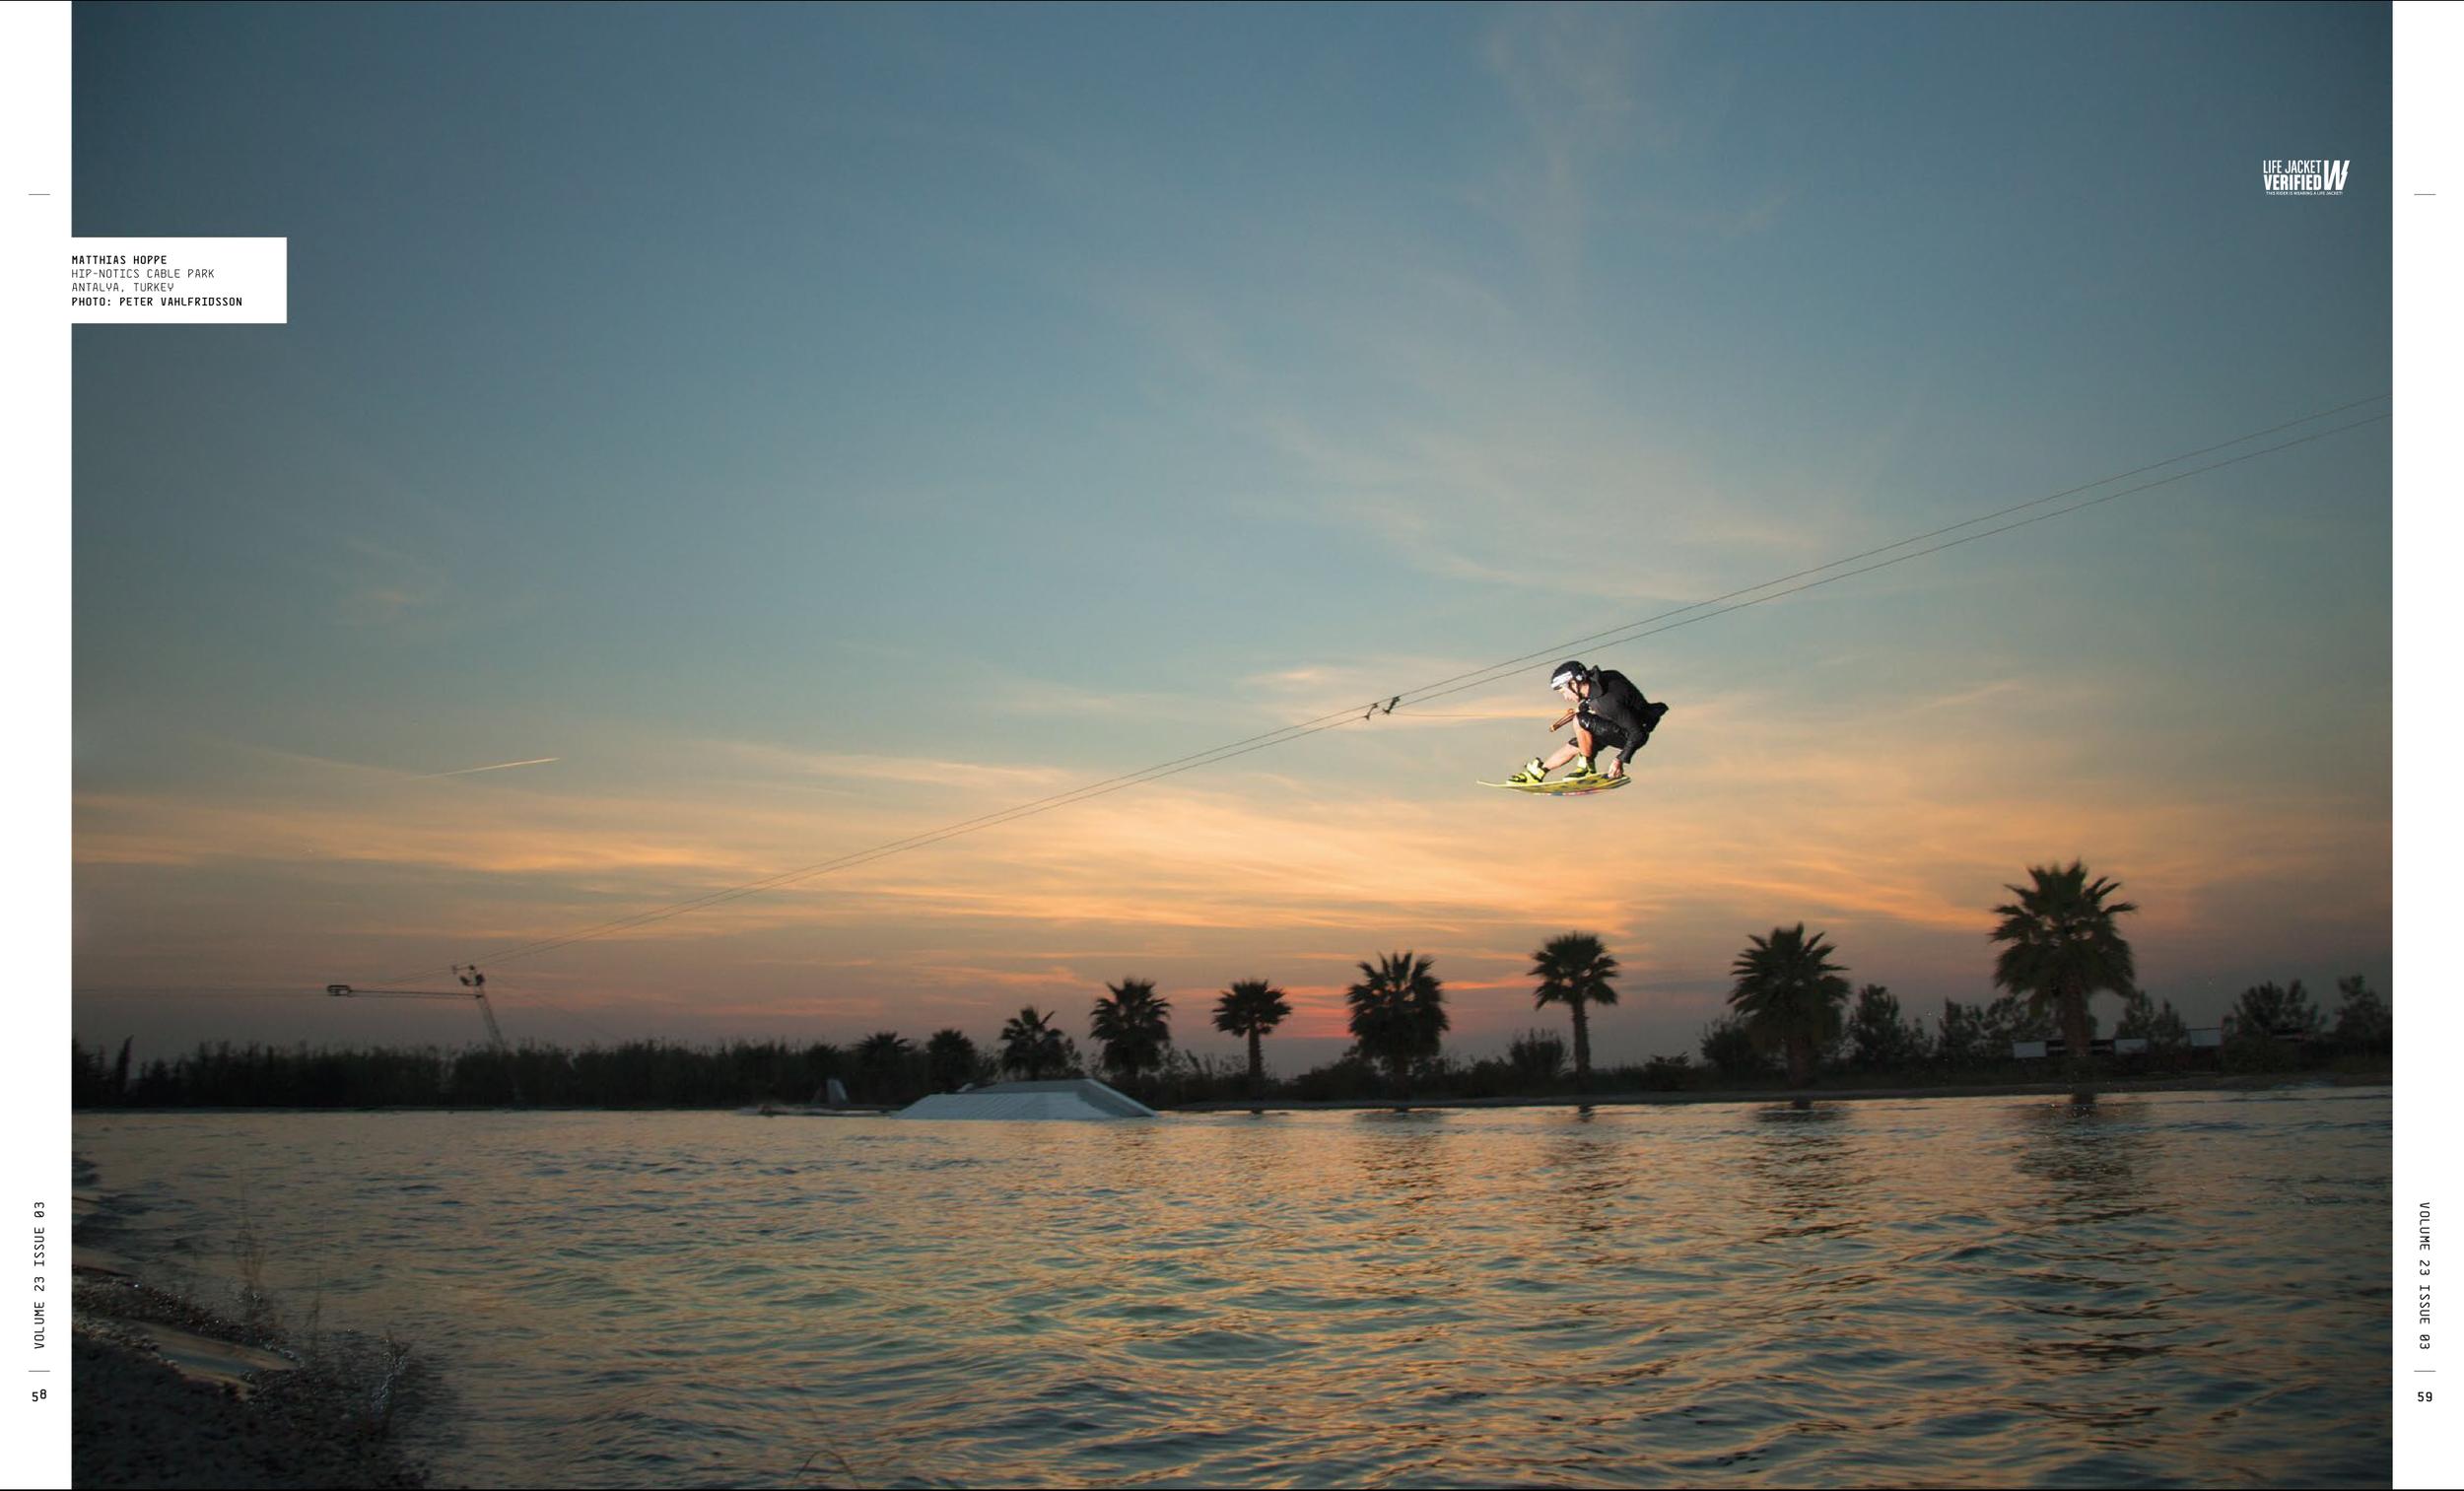 WakeboardingMag_Breddas.png